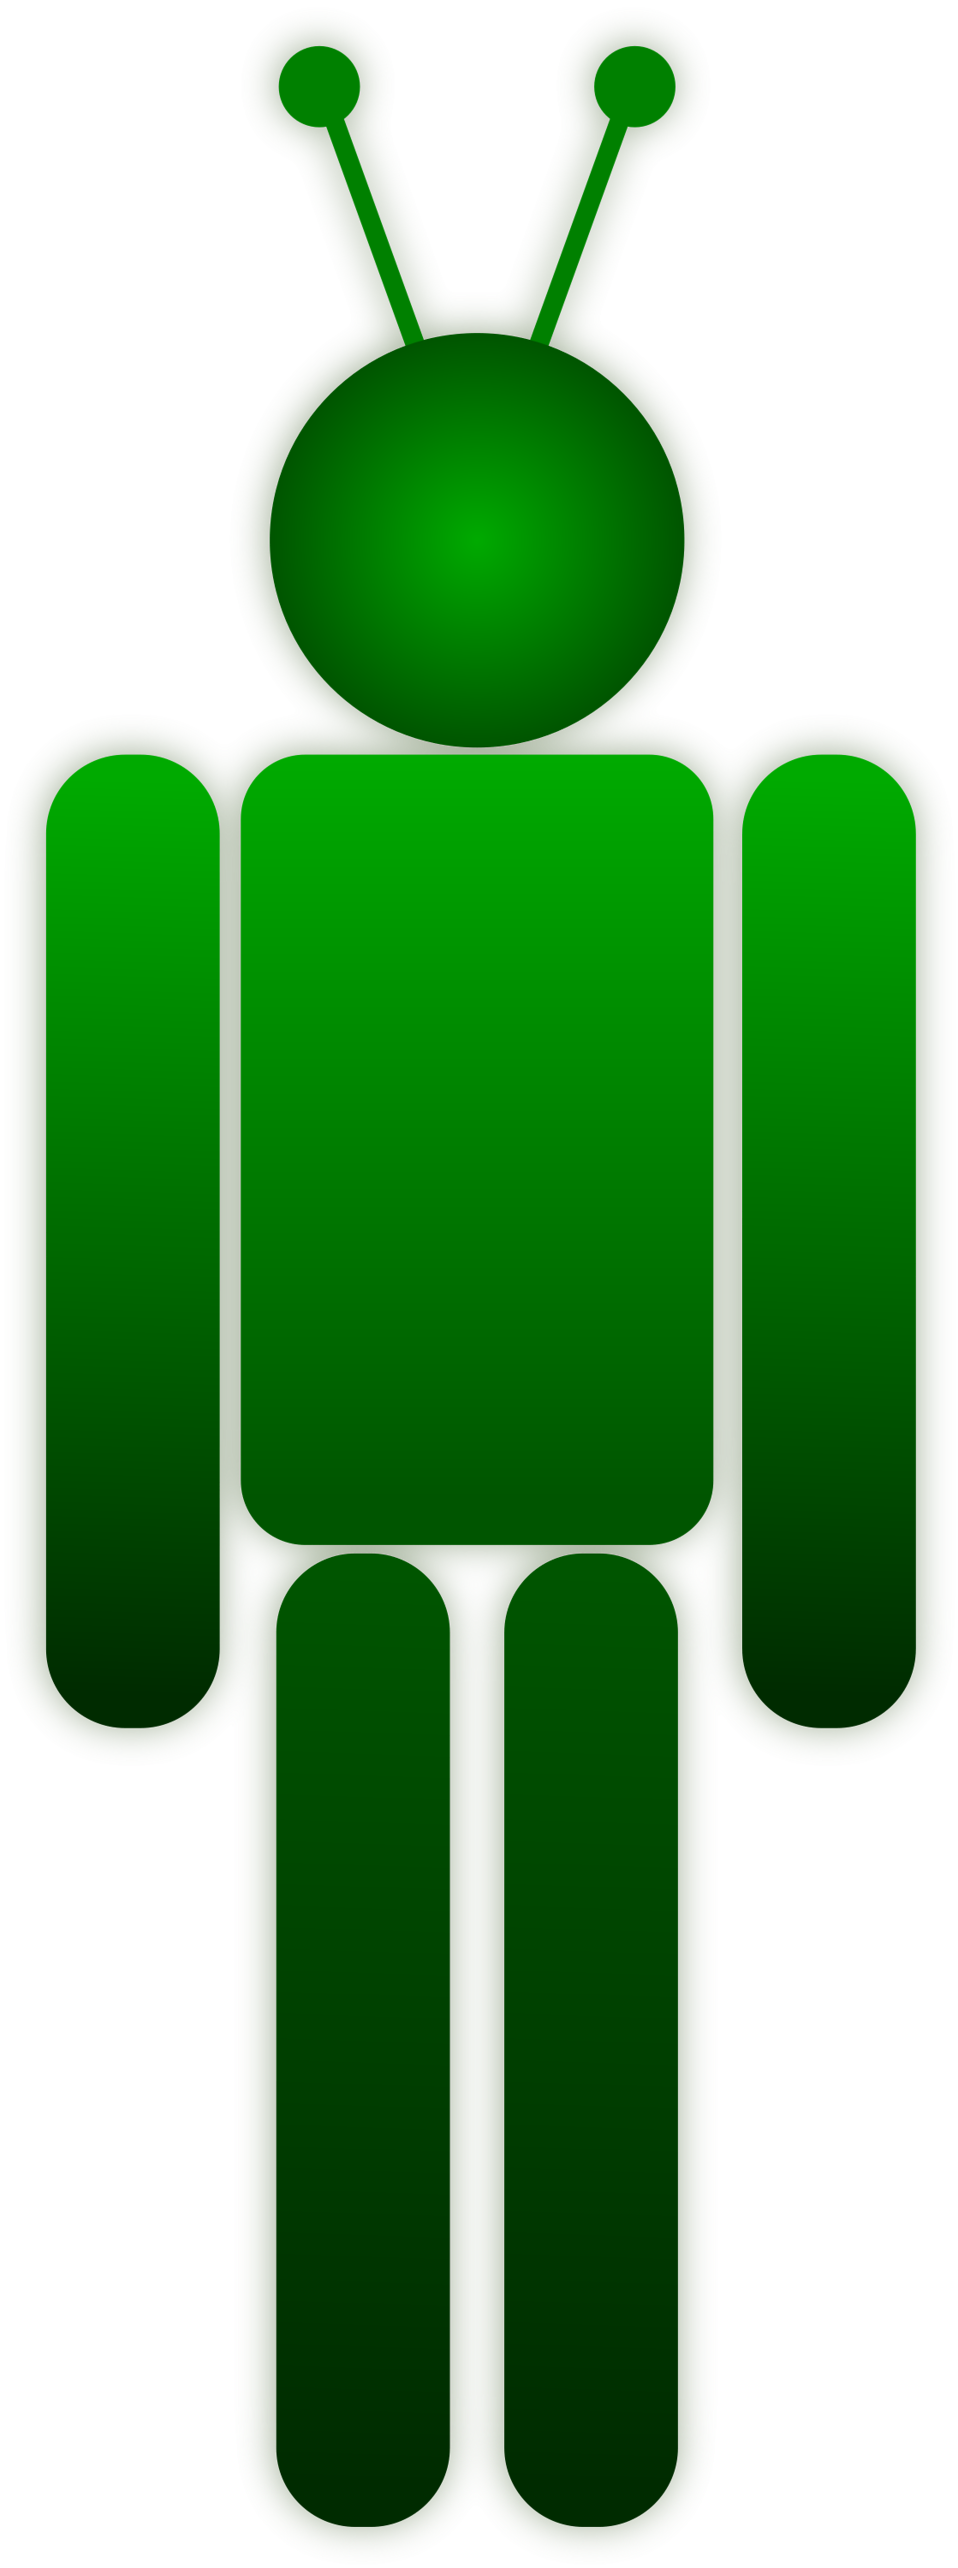 Illustration of a green cartoon robot : Free Stock Photo